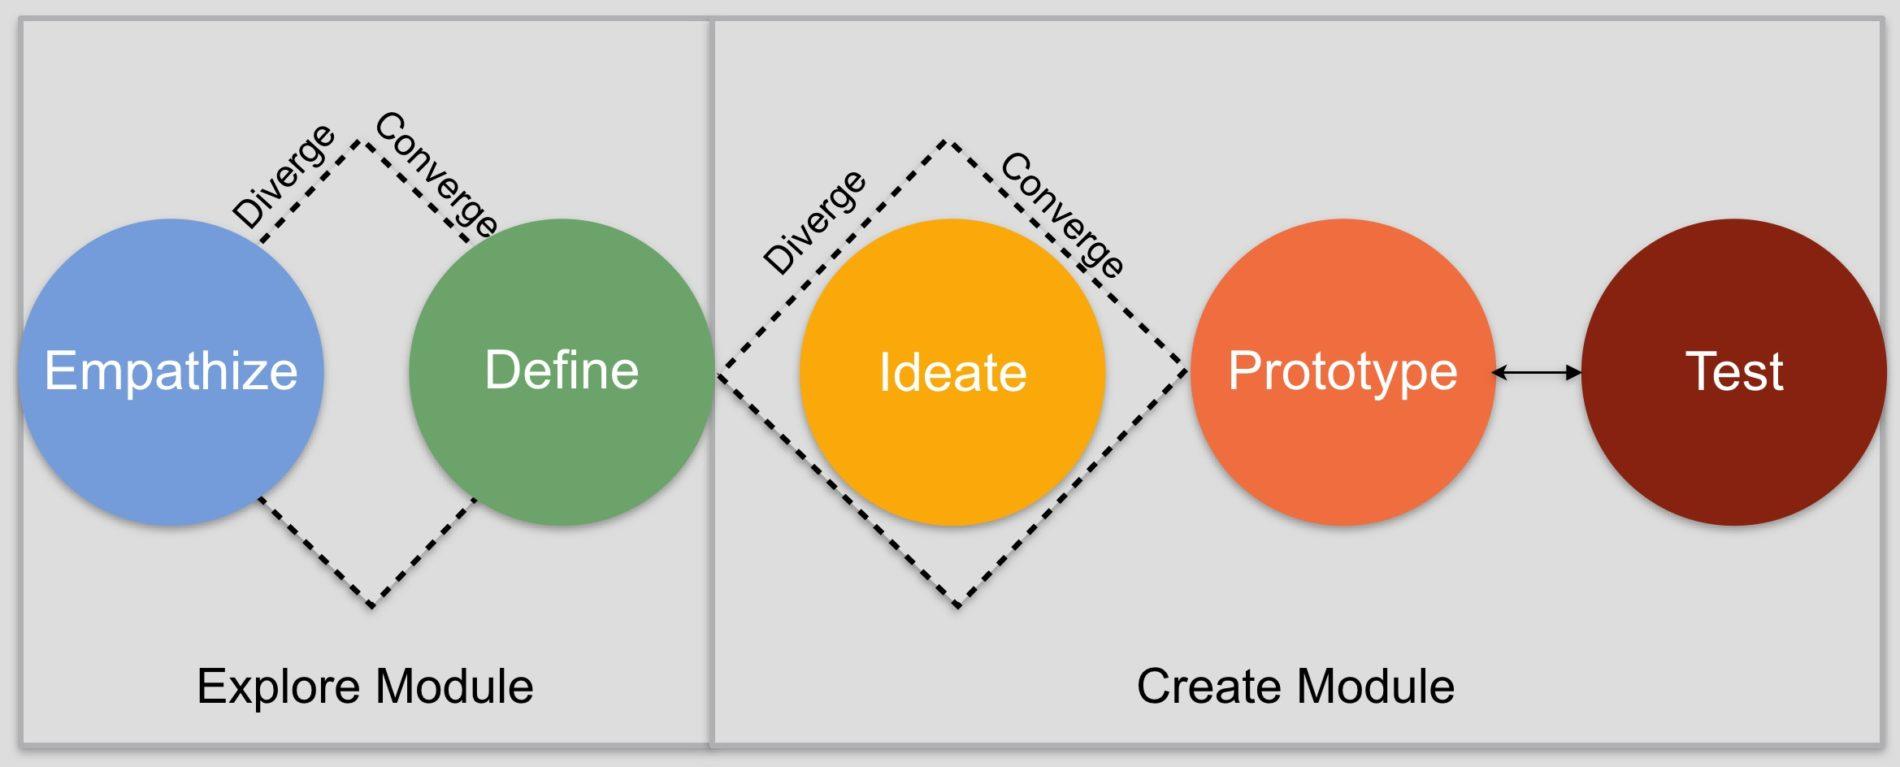 Design thinking workshop agenda and process innominds.eu